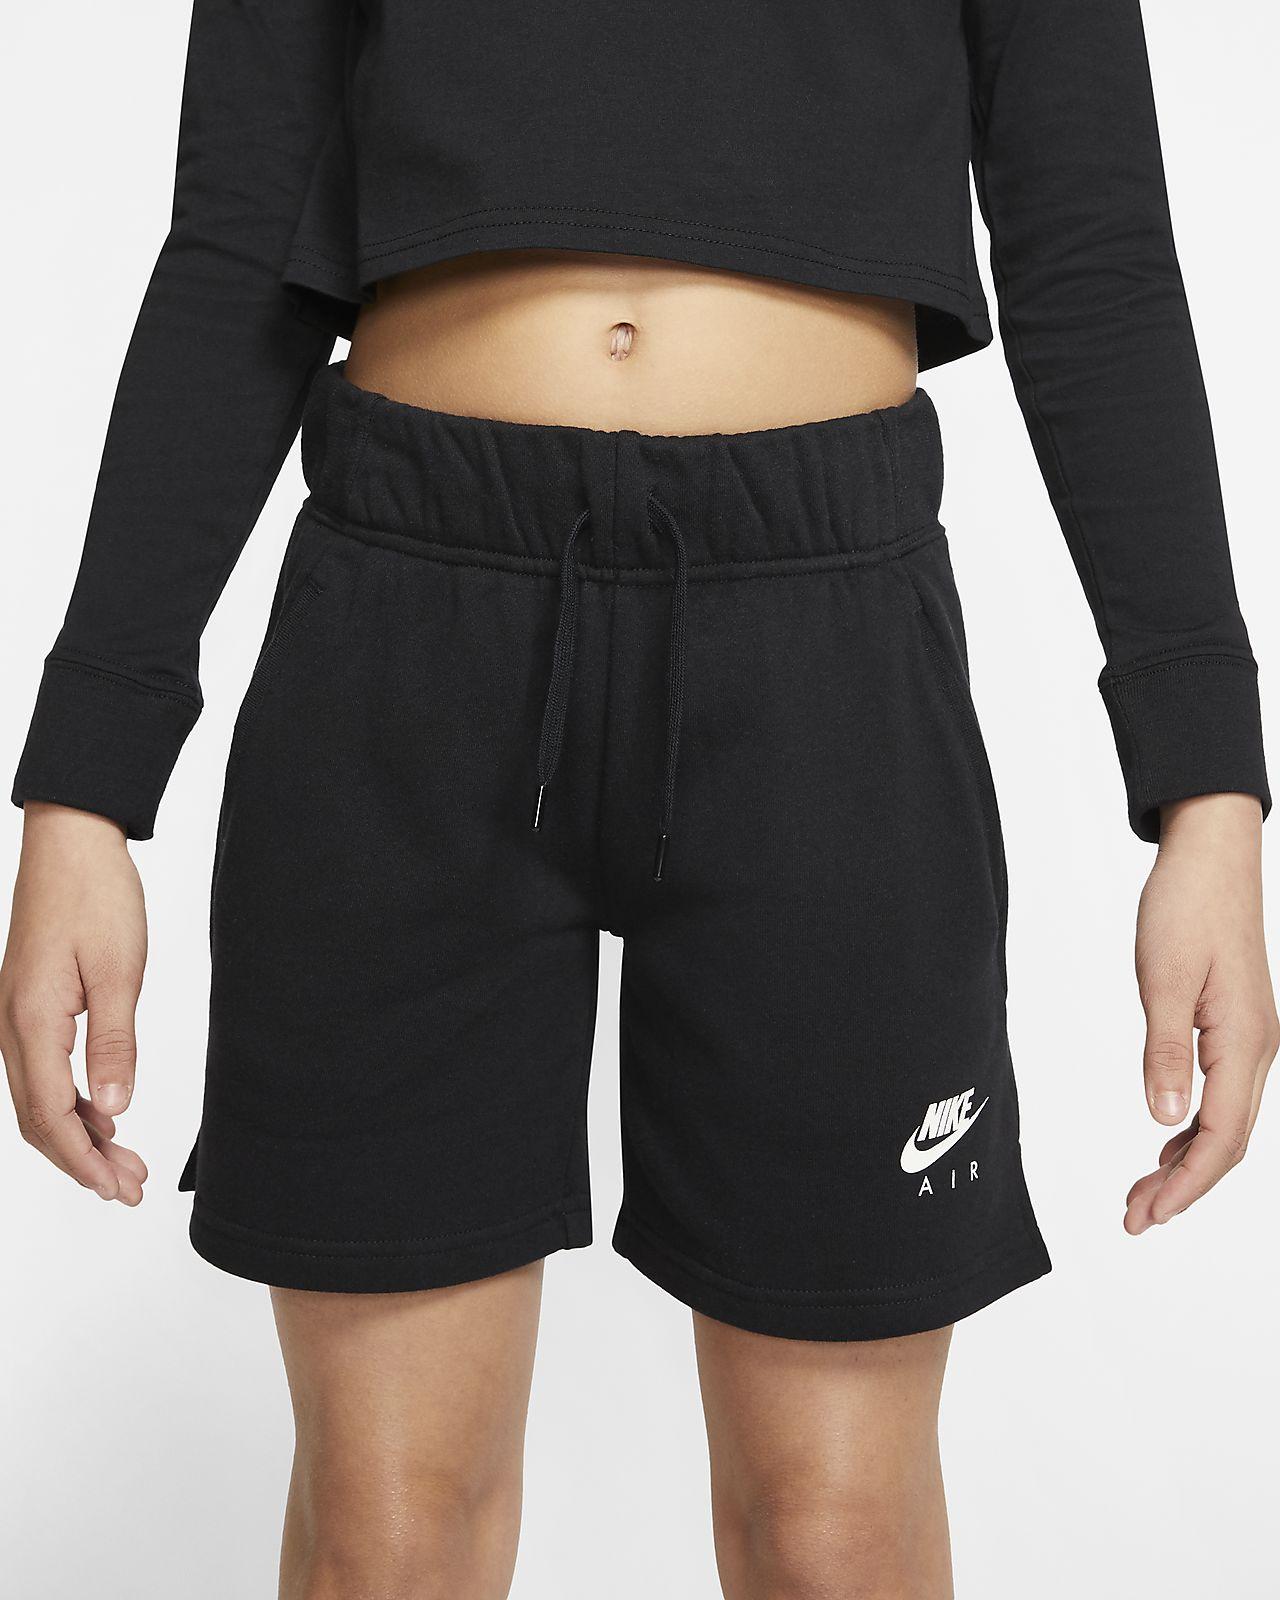 Nike Air shorts for store barn (jente). Nike NO